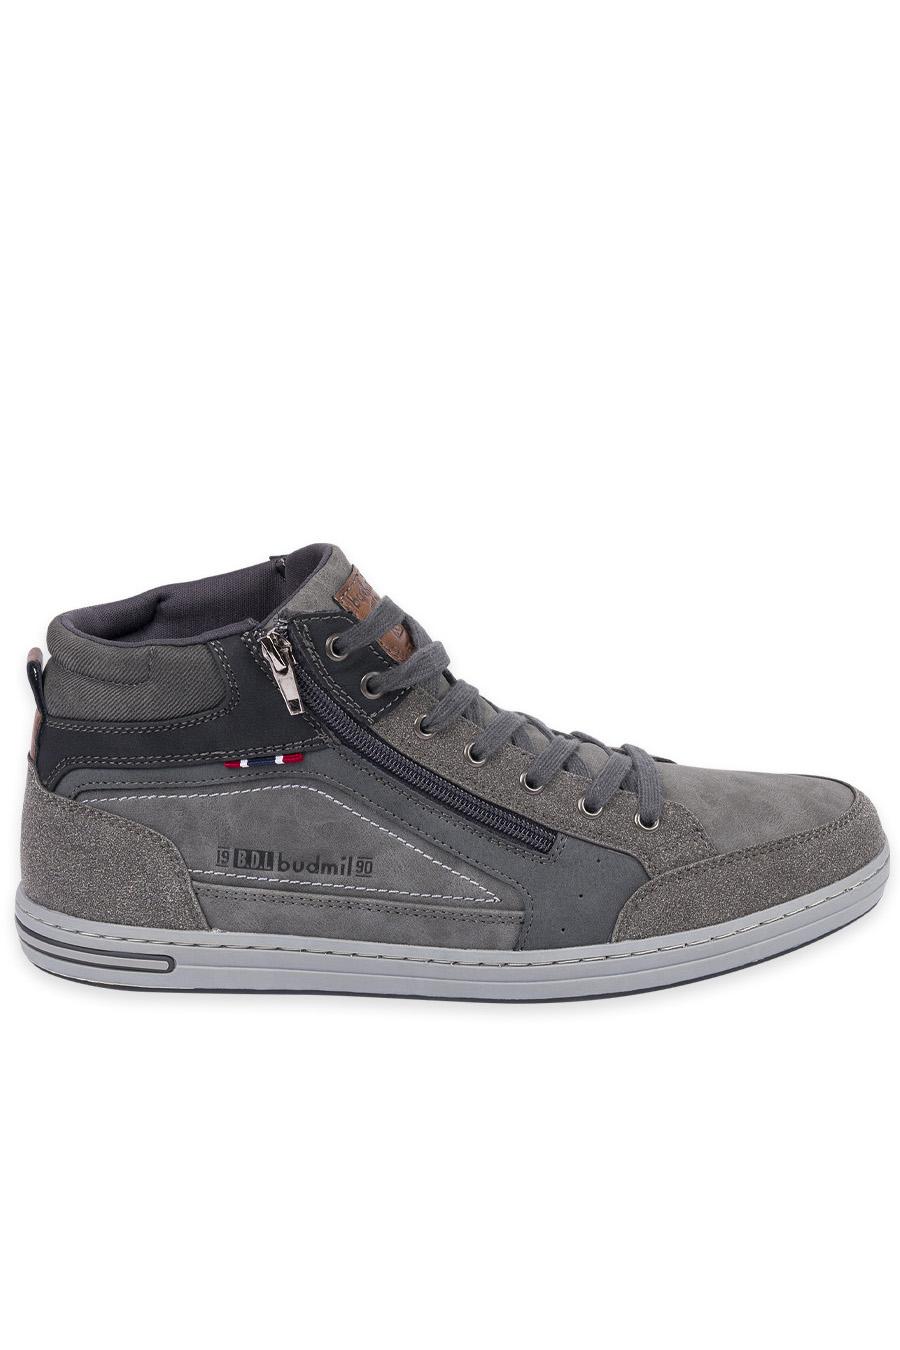 férfi utcai cipő szürke Kényelmes Férfi Cipők budmil férfi utcai cipő | budmil